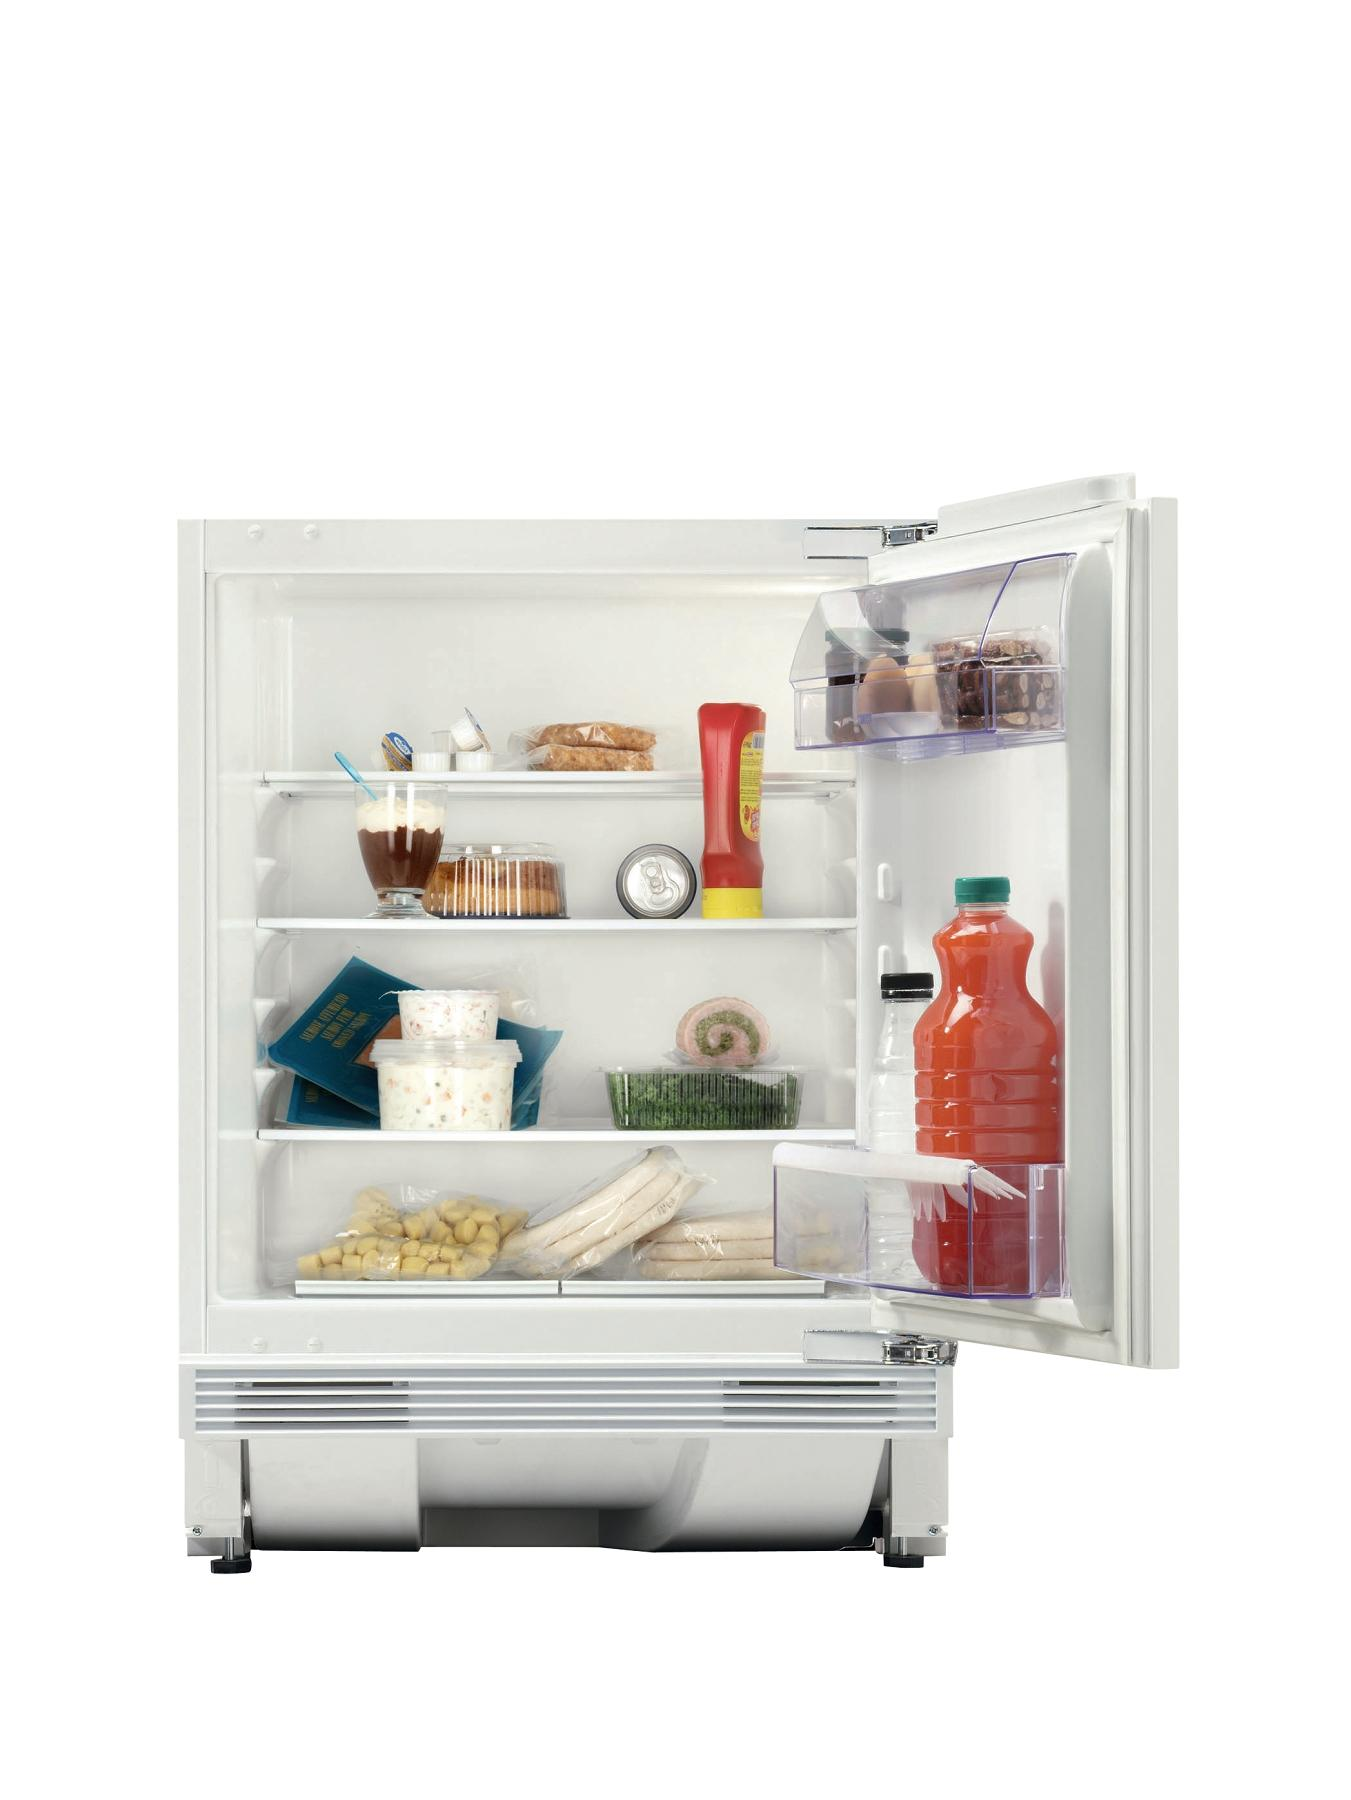 zqa14030da integrated under counter fridge. Black Bedroom Furniture Sets. Home Design Ideas